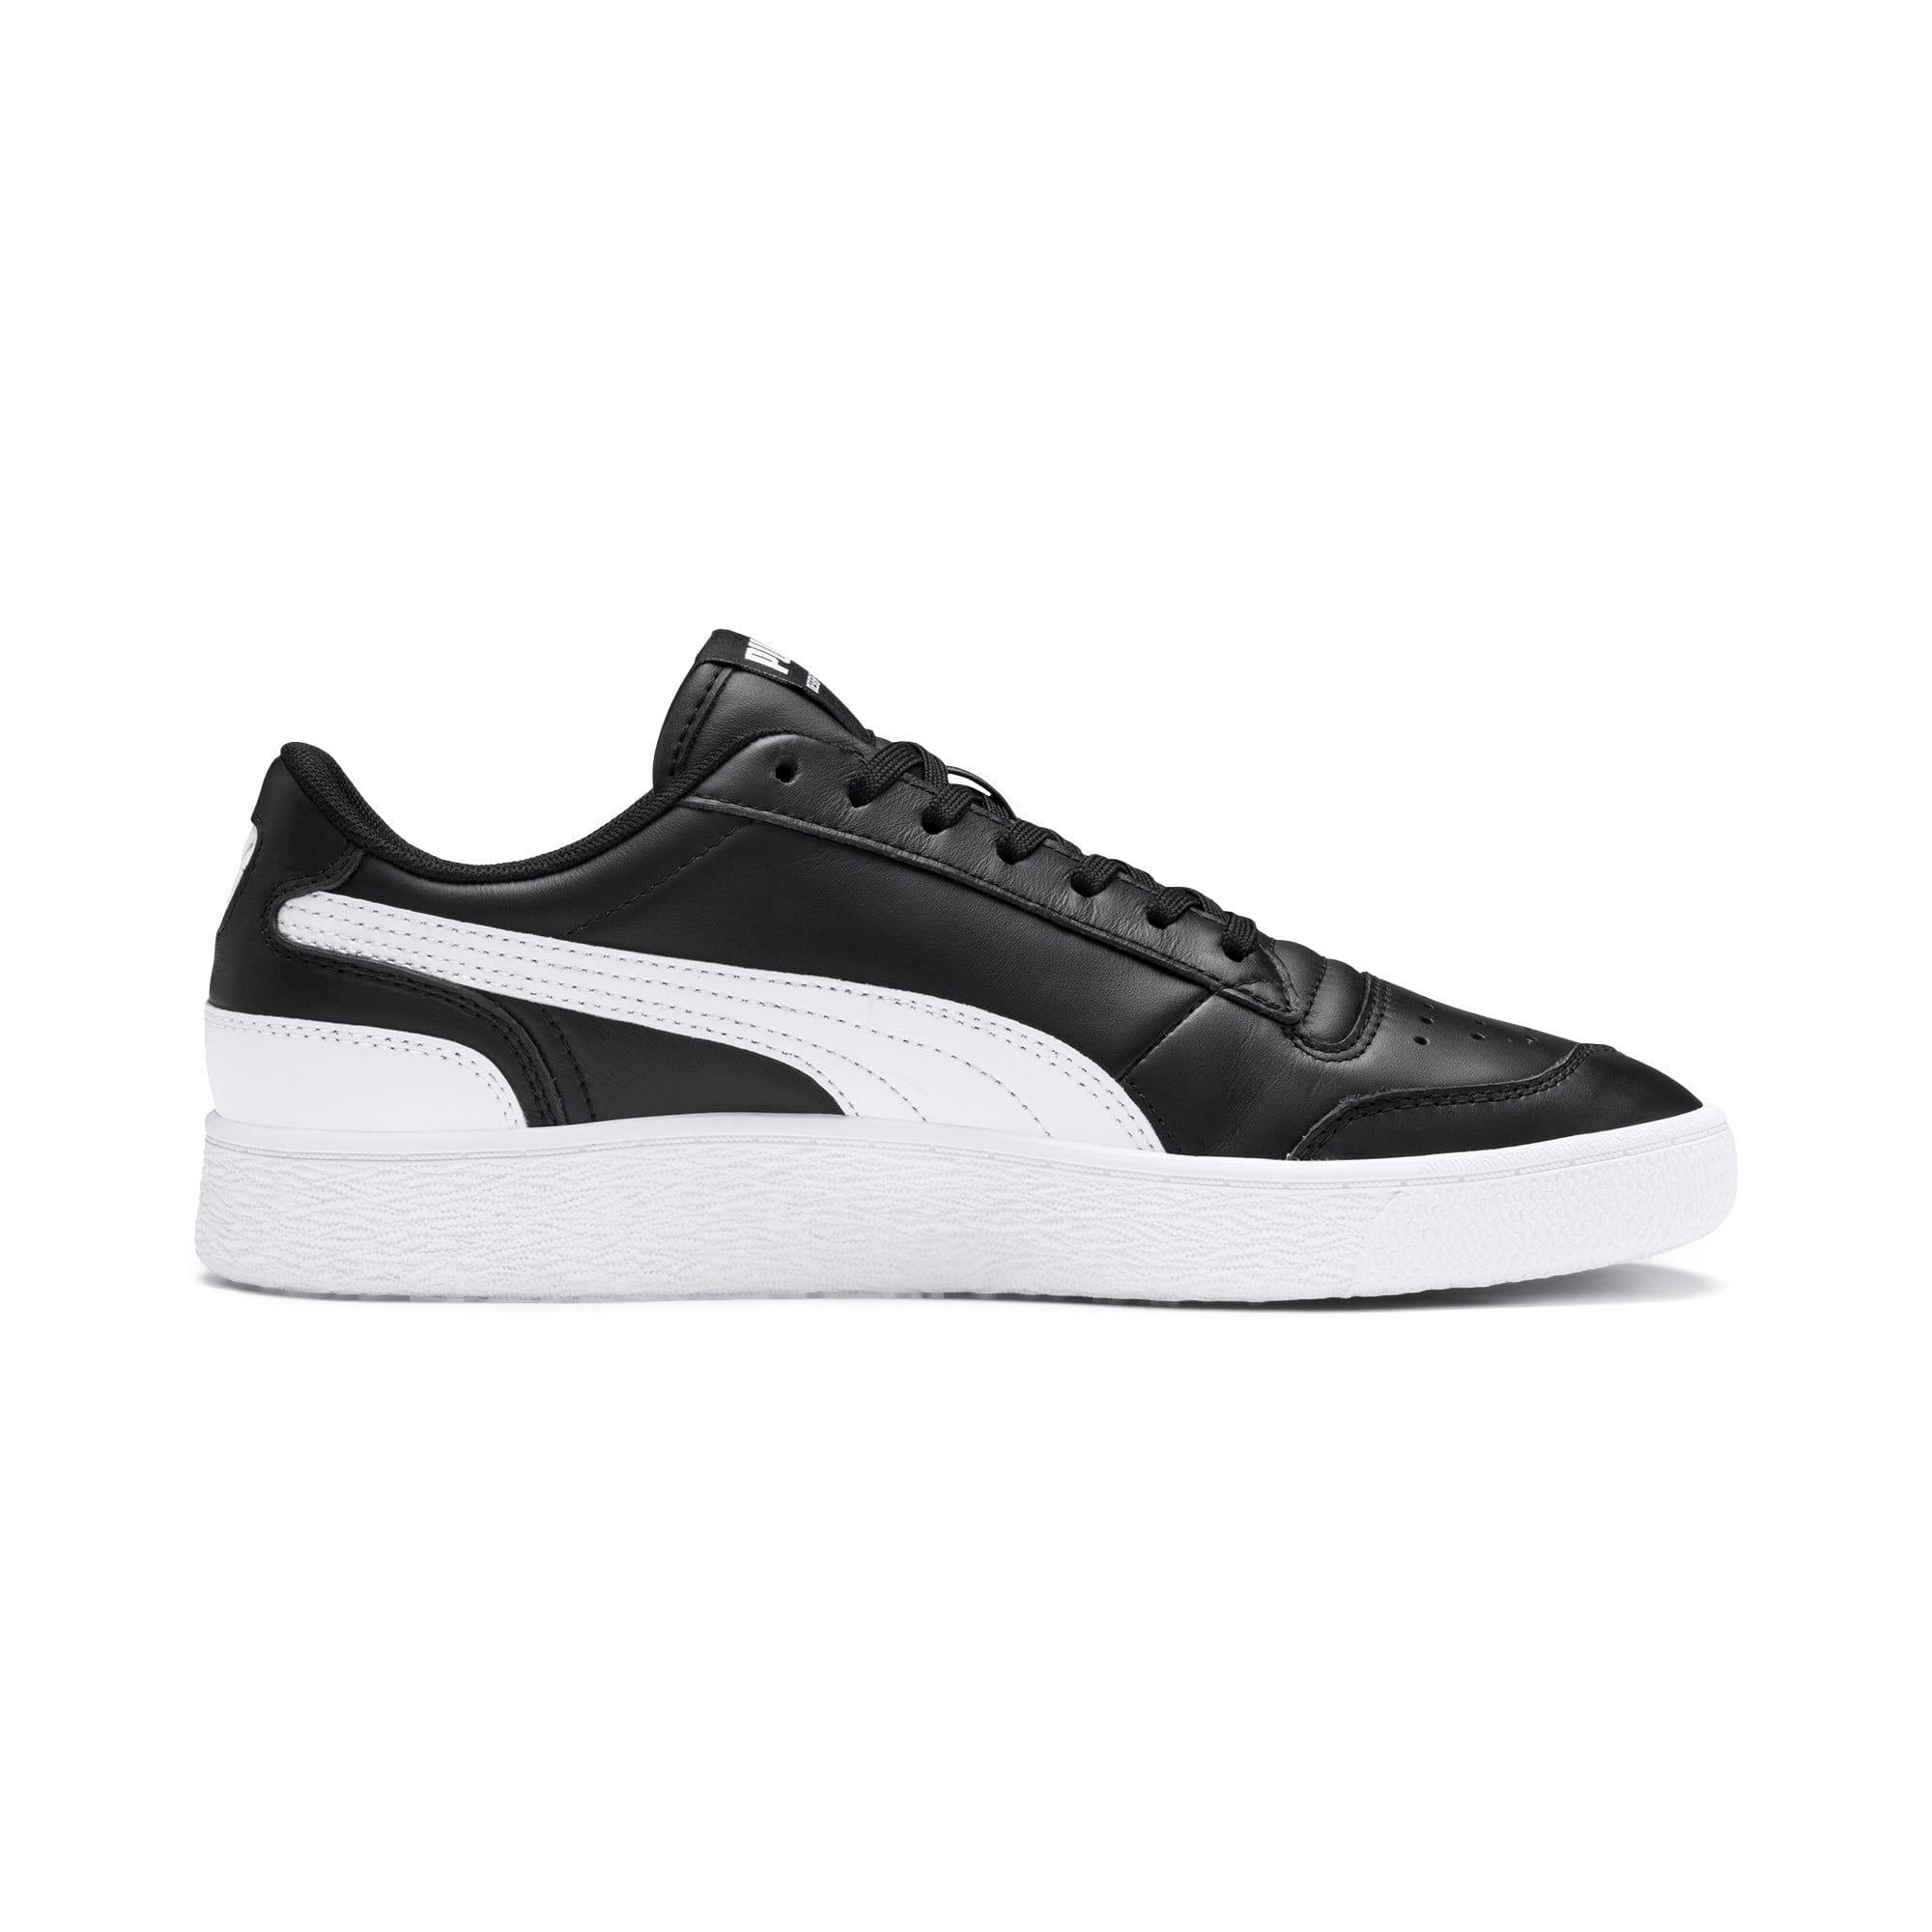 Thumbnail 5 of Ralph Sampson Lo Sneakers, Puma Blk-Puma Wht-Puma Wht, medium